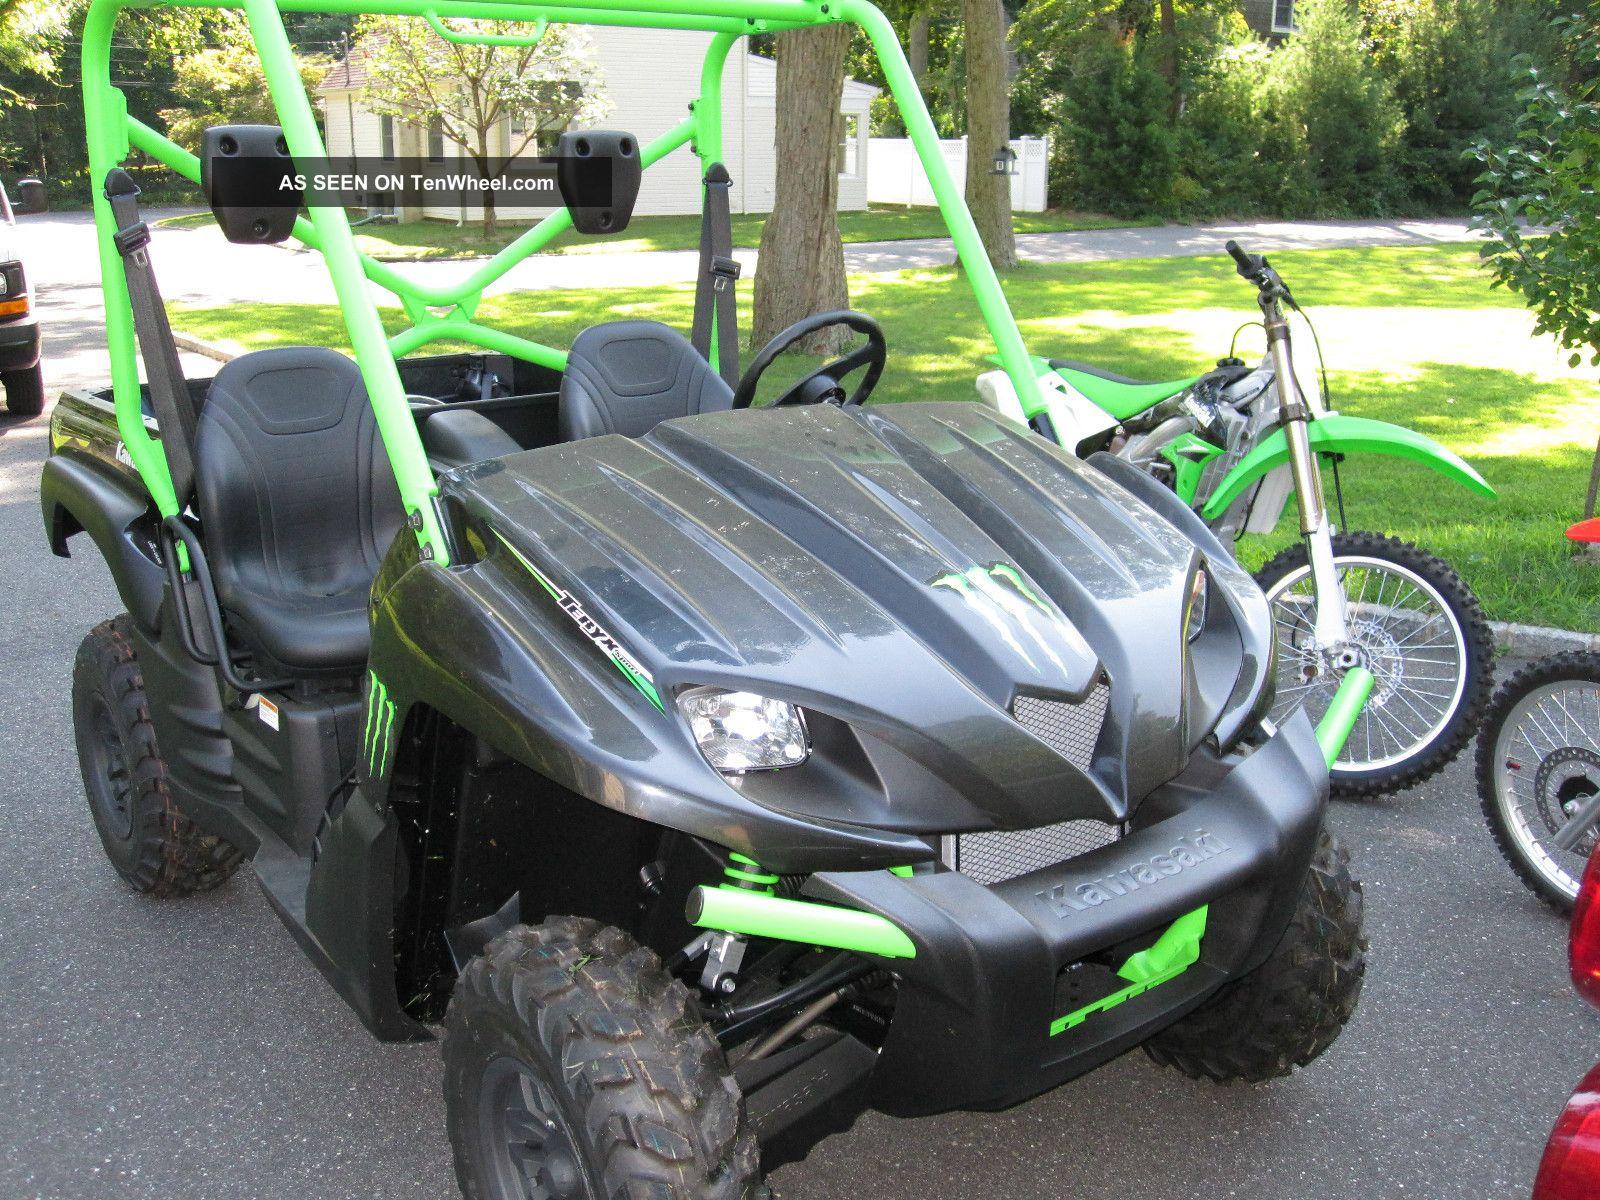 Kawasaki Teryx Monster Edition Specs